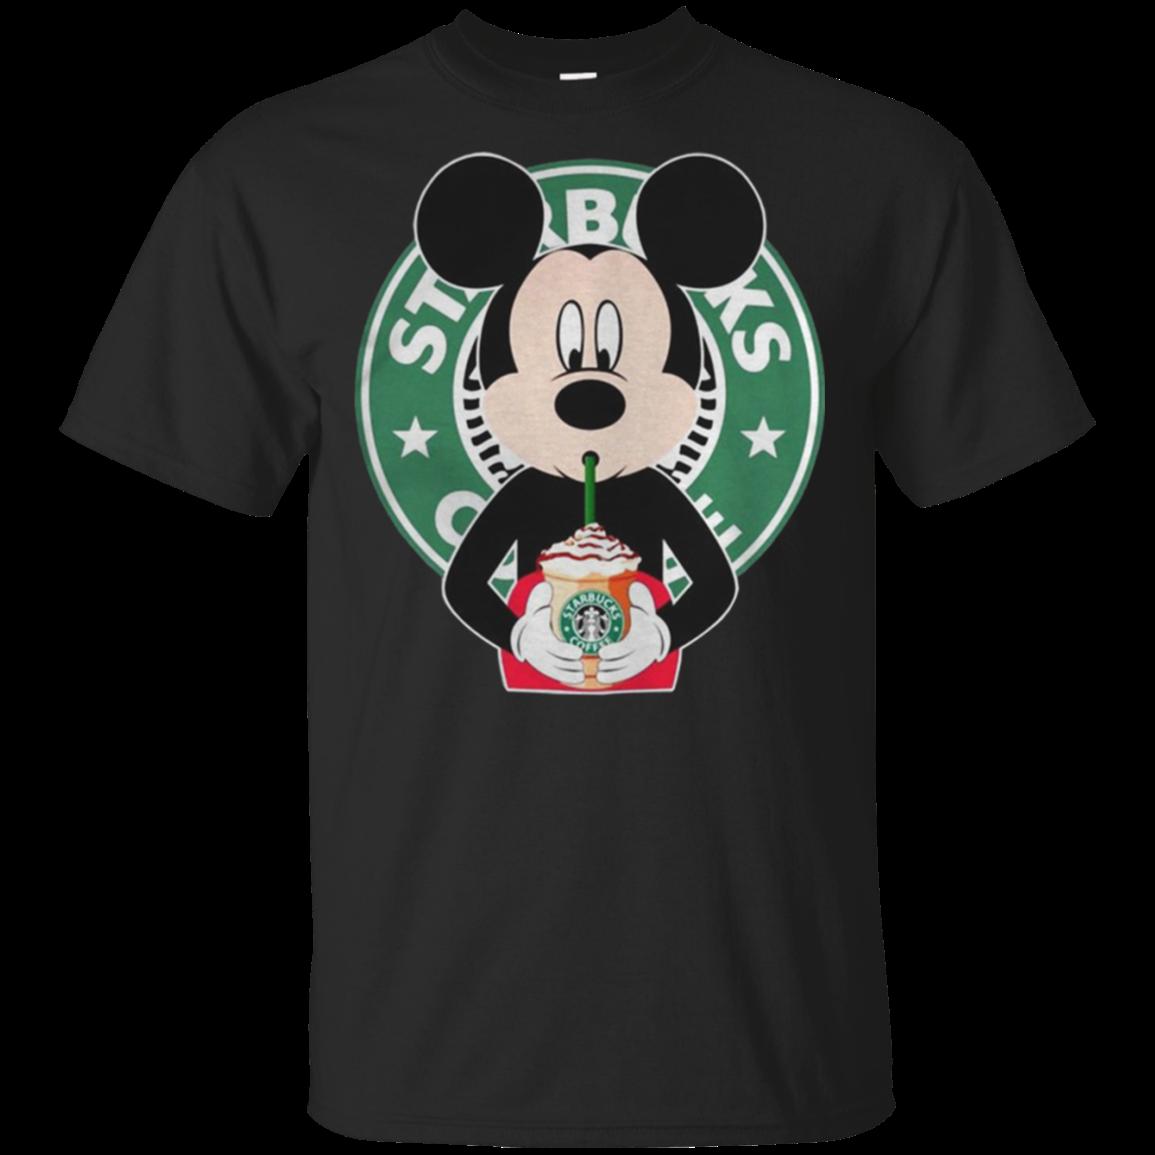 Mickey Mouse drinks Starbucks coffee shirt t shirt